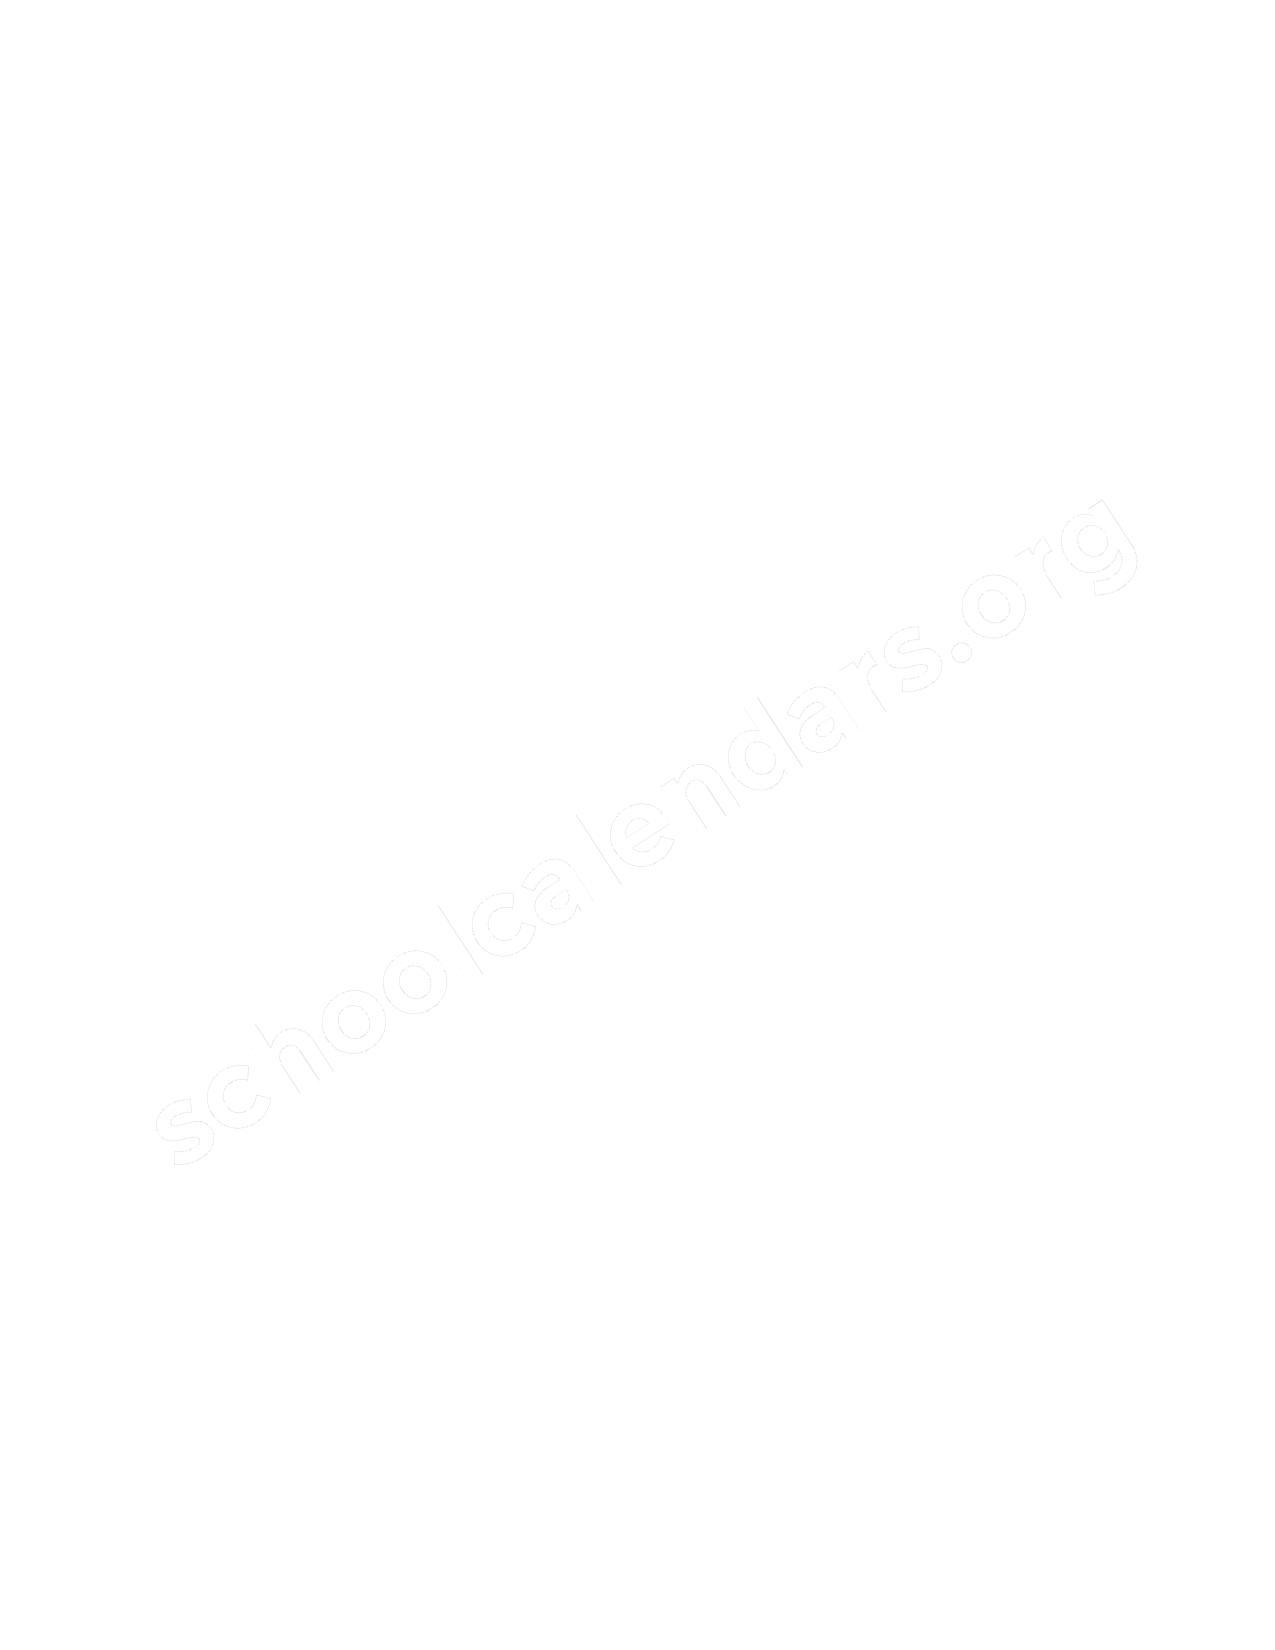 2017 - 2018 District Calendar – Rockingham County Schools – page 14